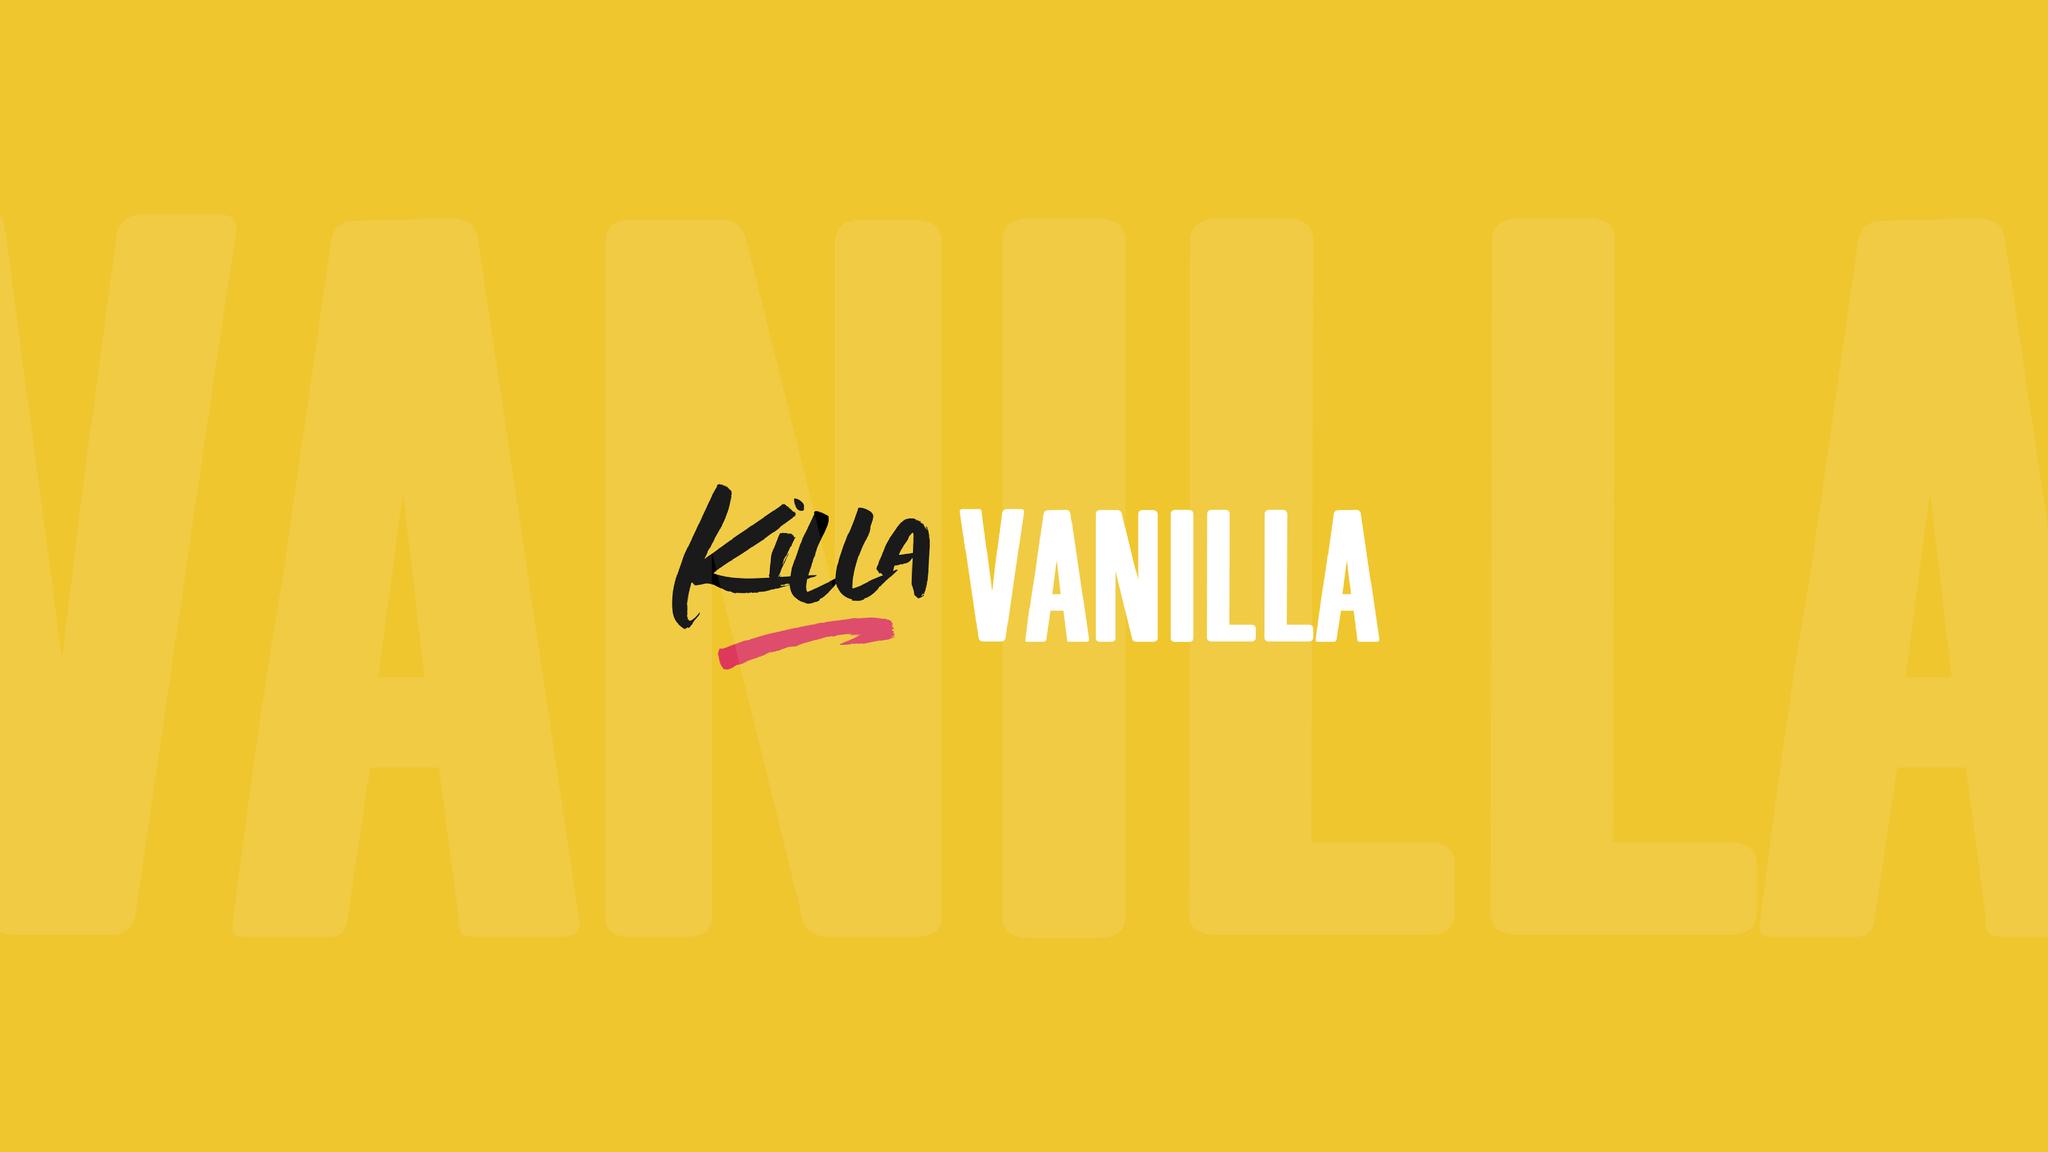 Killa Vanilla